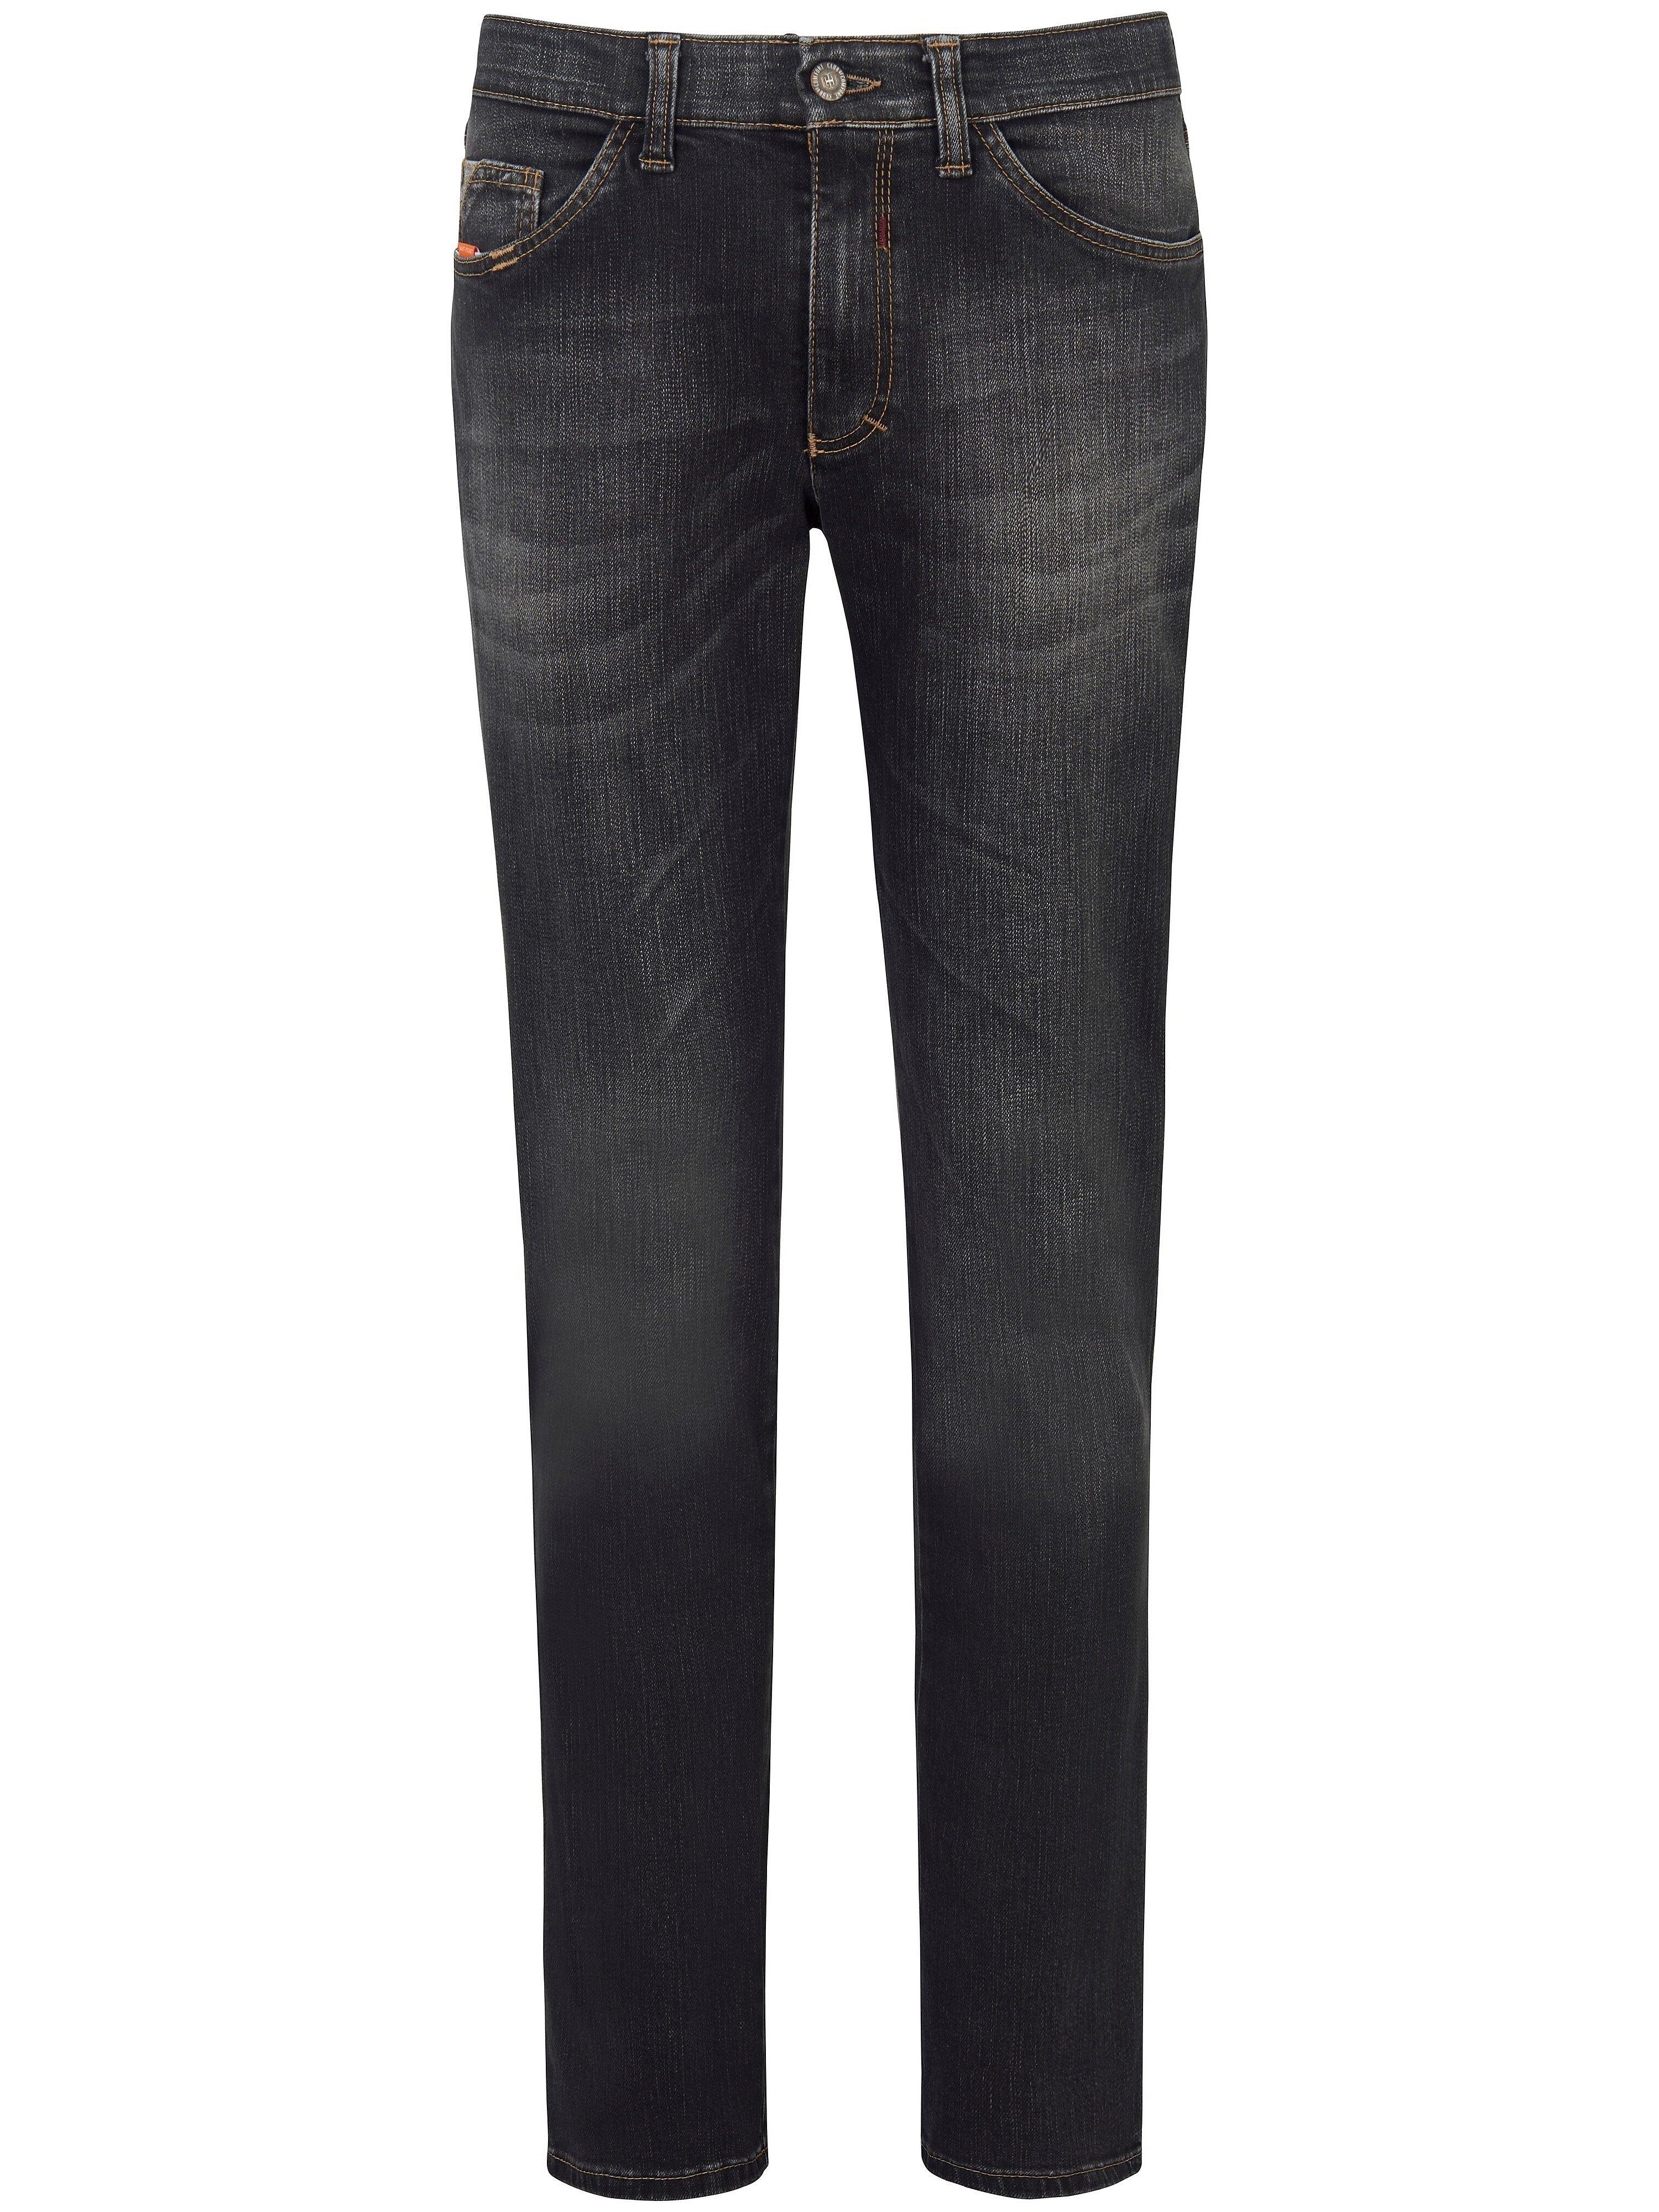 Jeans, model Henry Van CLUB OF COMFORT denim